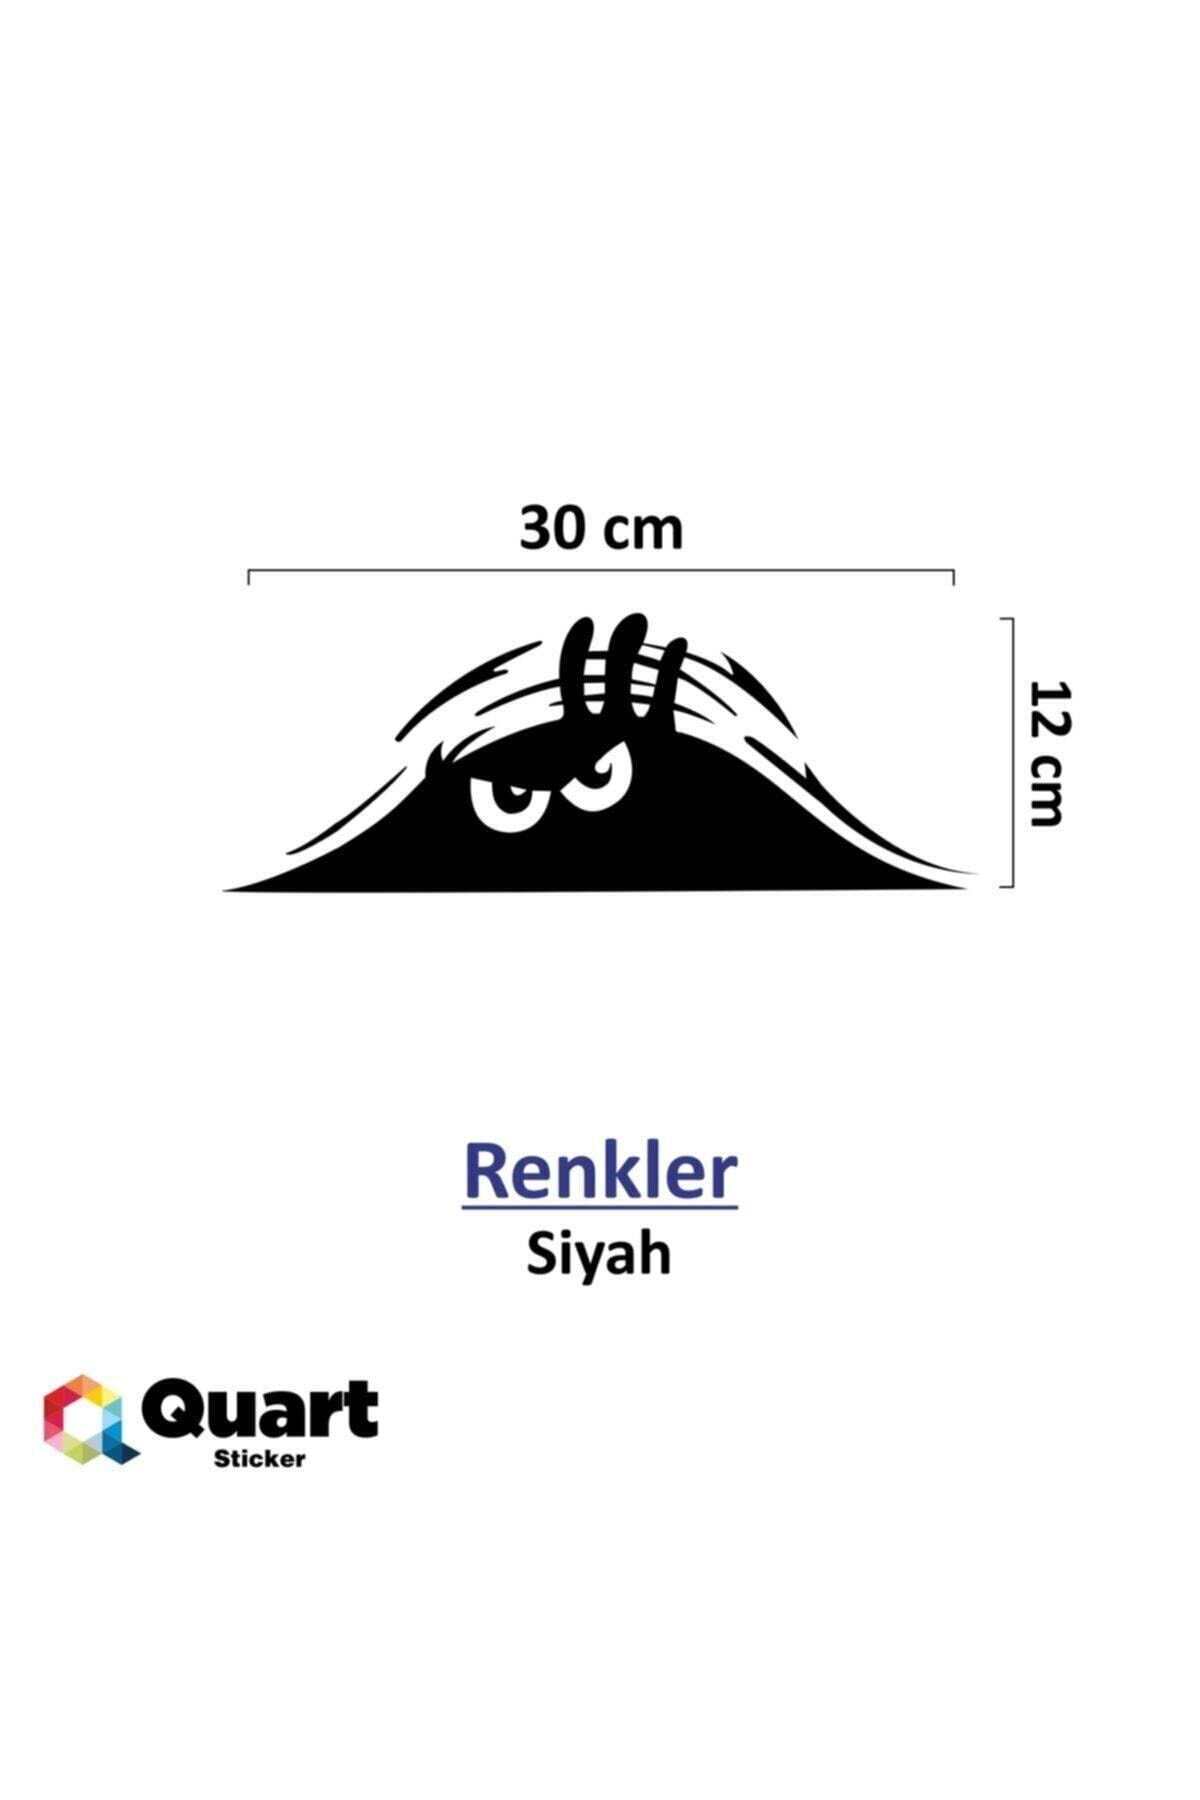 Quart Aksesuar Siyah 30 cm Bagajdan Bakan Adam Oto Sticker Araba Sticker 2